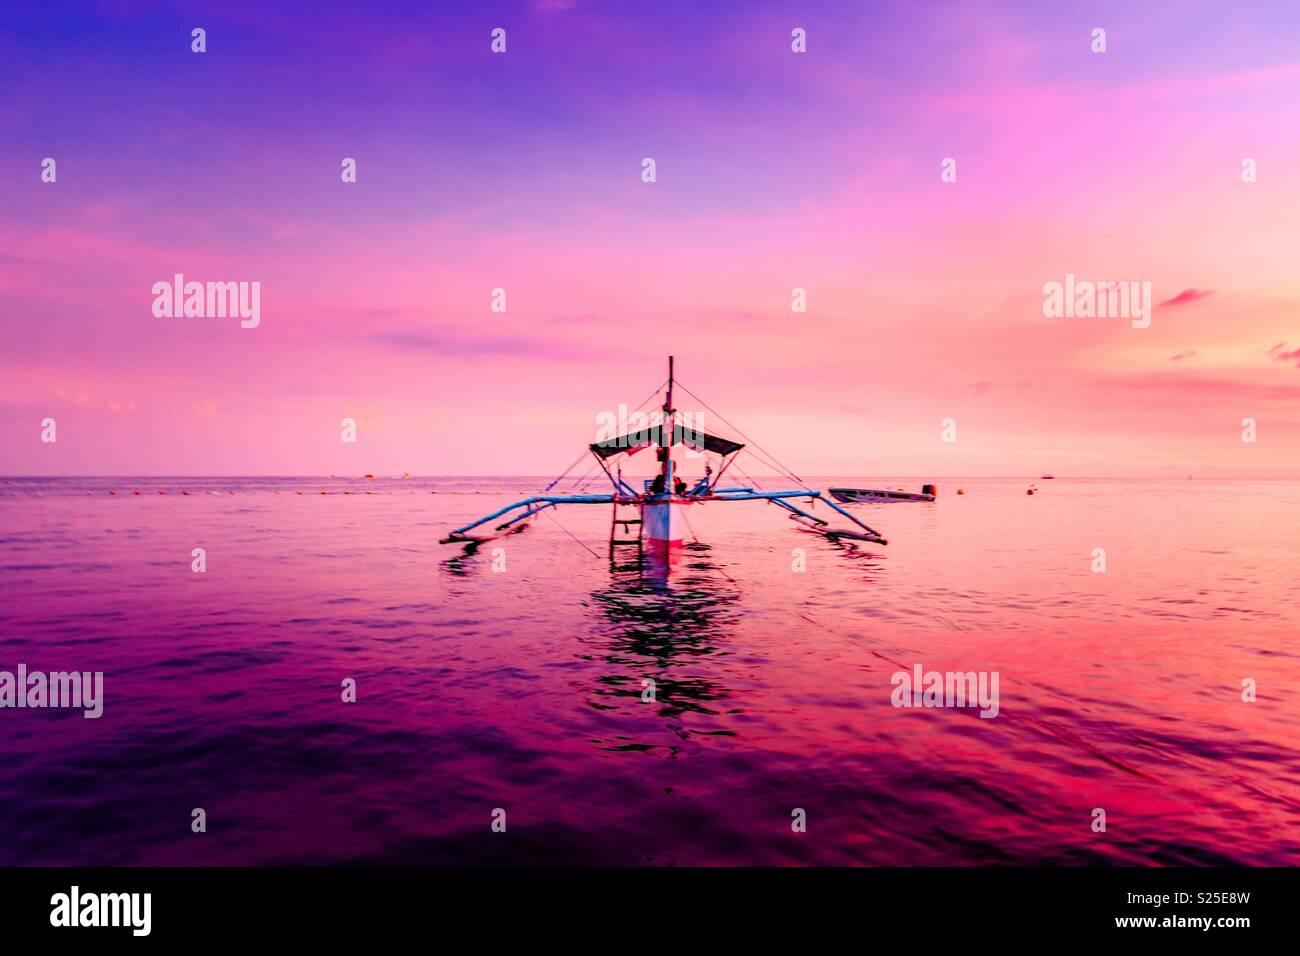 Atardecer en la playa de Morong, Bataan, Filipinas Imagen De Stock